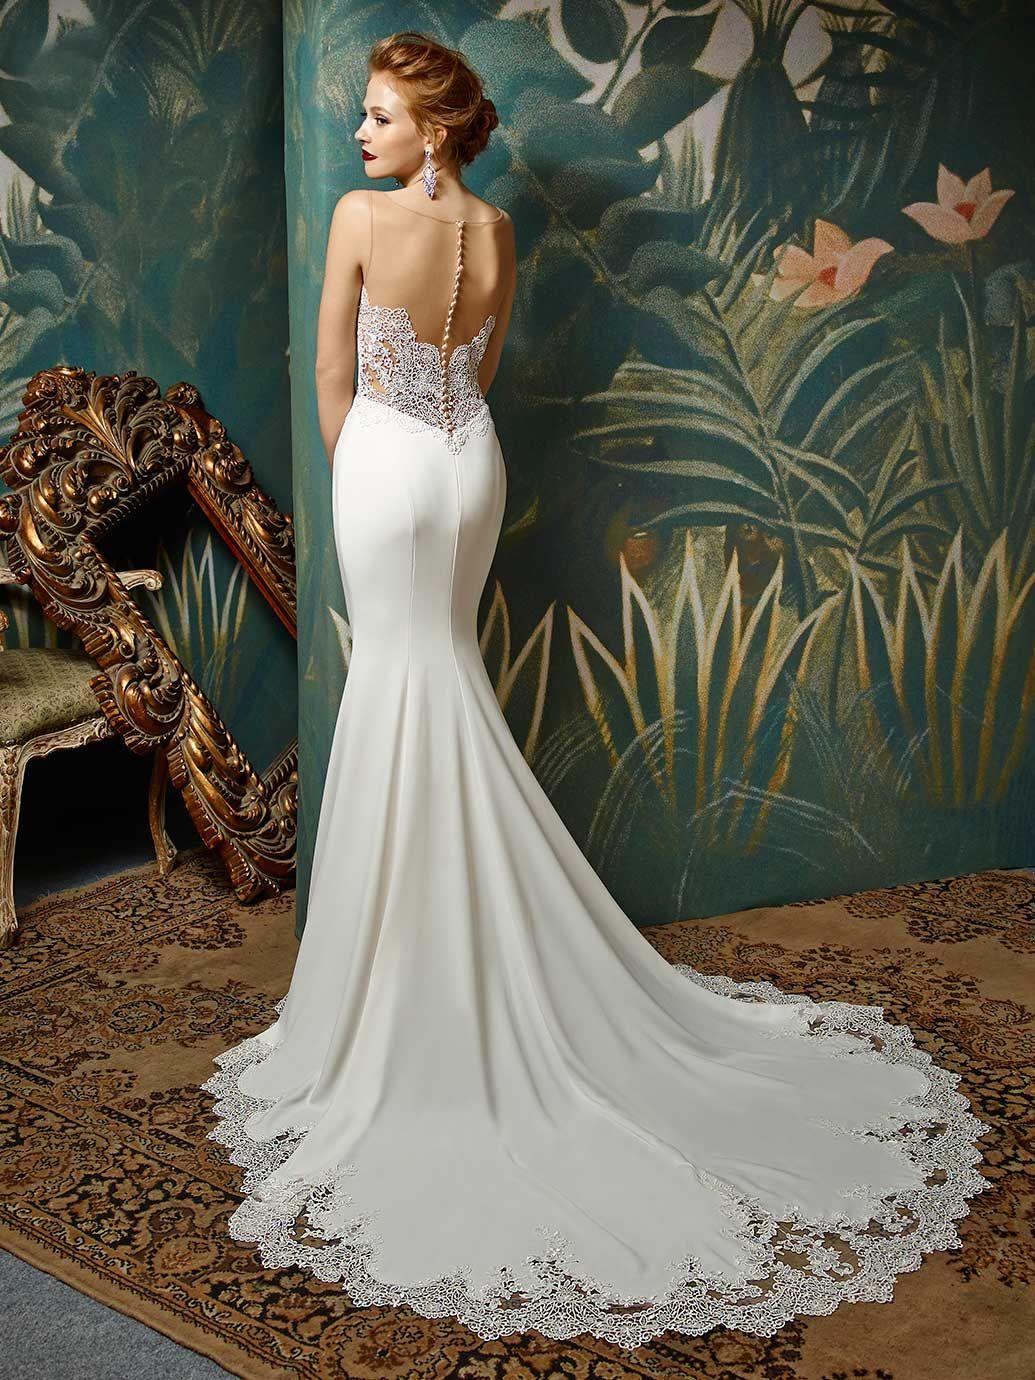 Mermaid Wedding Dresses Kent : Back wedding hair bells gowns bridal dream dress